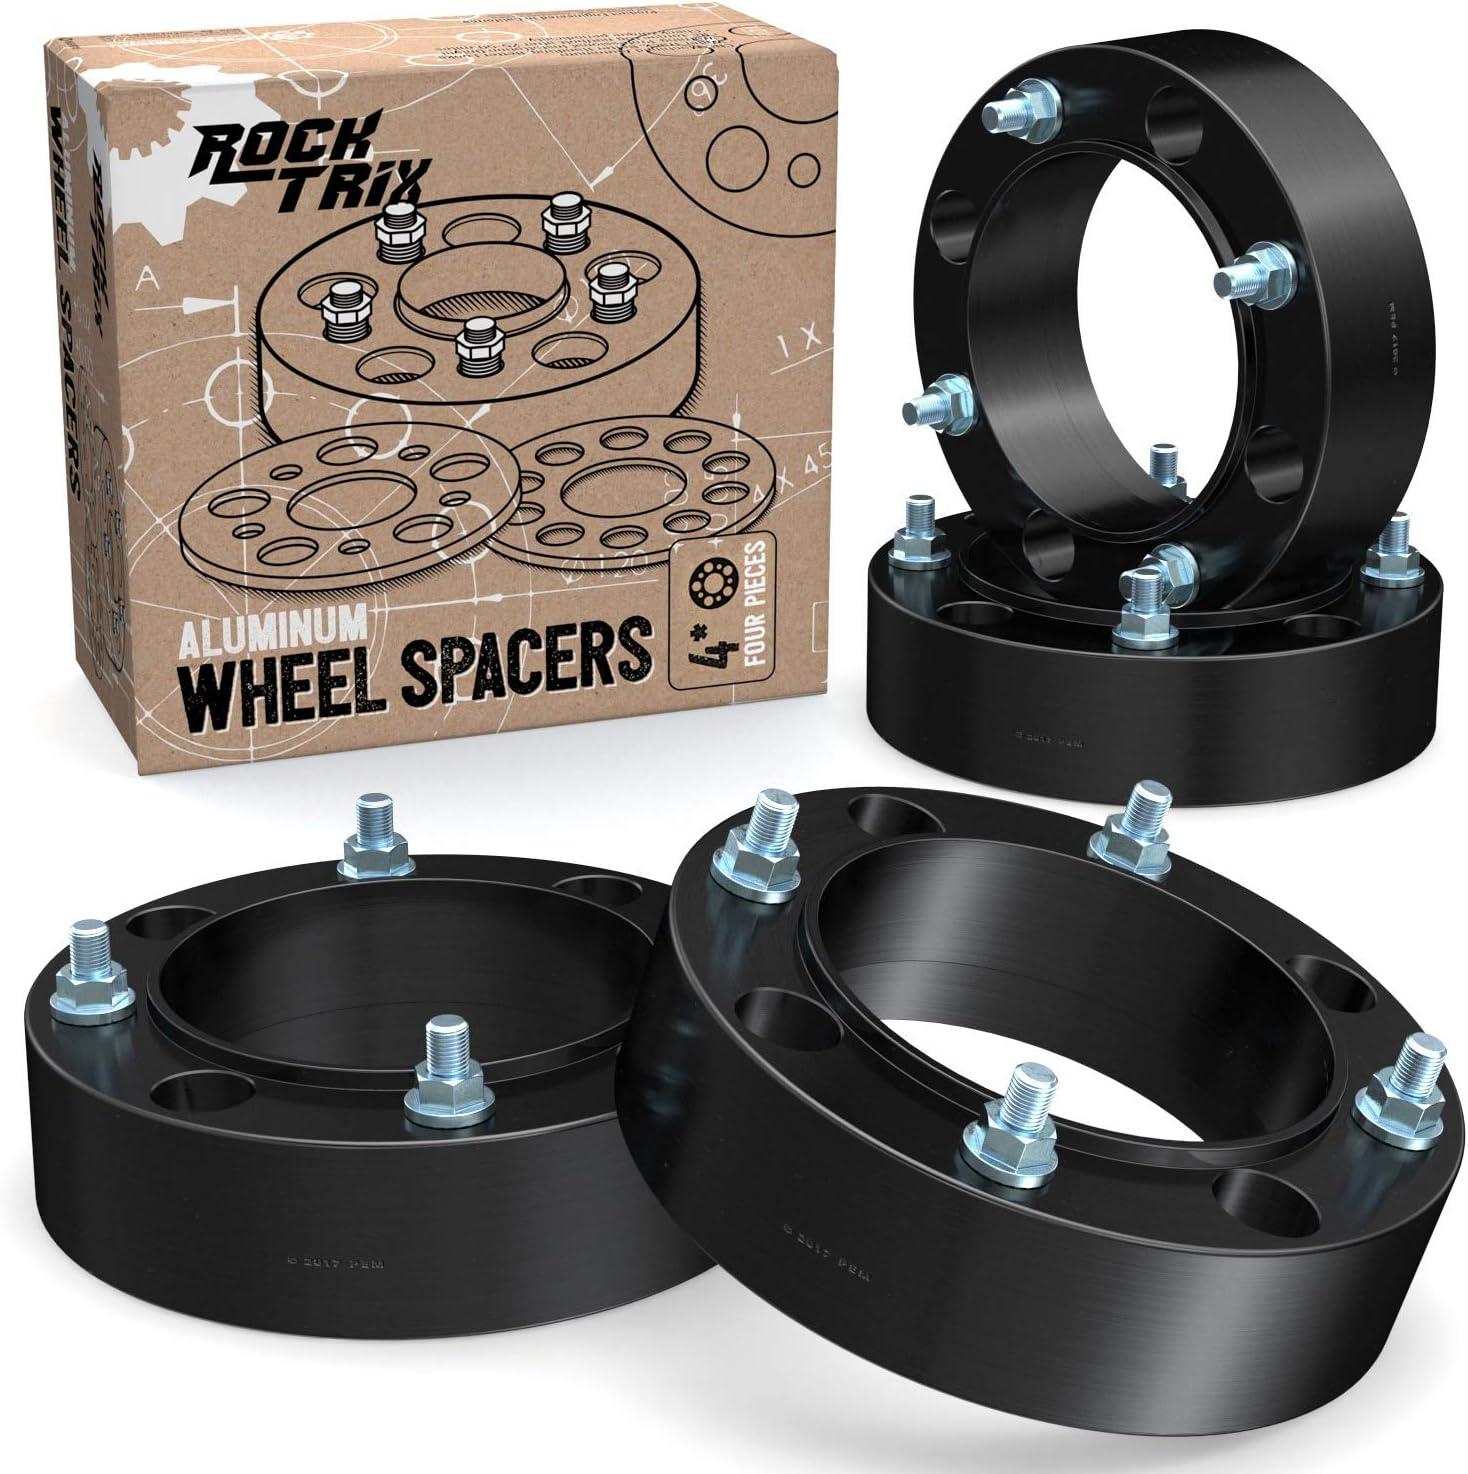 RockTrix - 1.5 inch ATV Wheel 4x156 Flat Spacers Studs 3 8x24 Al Max 89% OFF sold out.